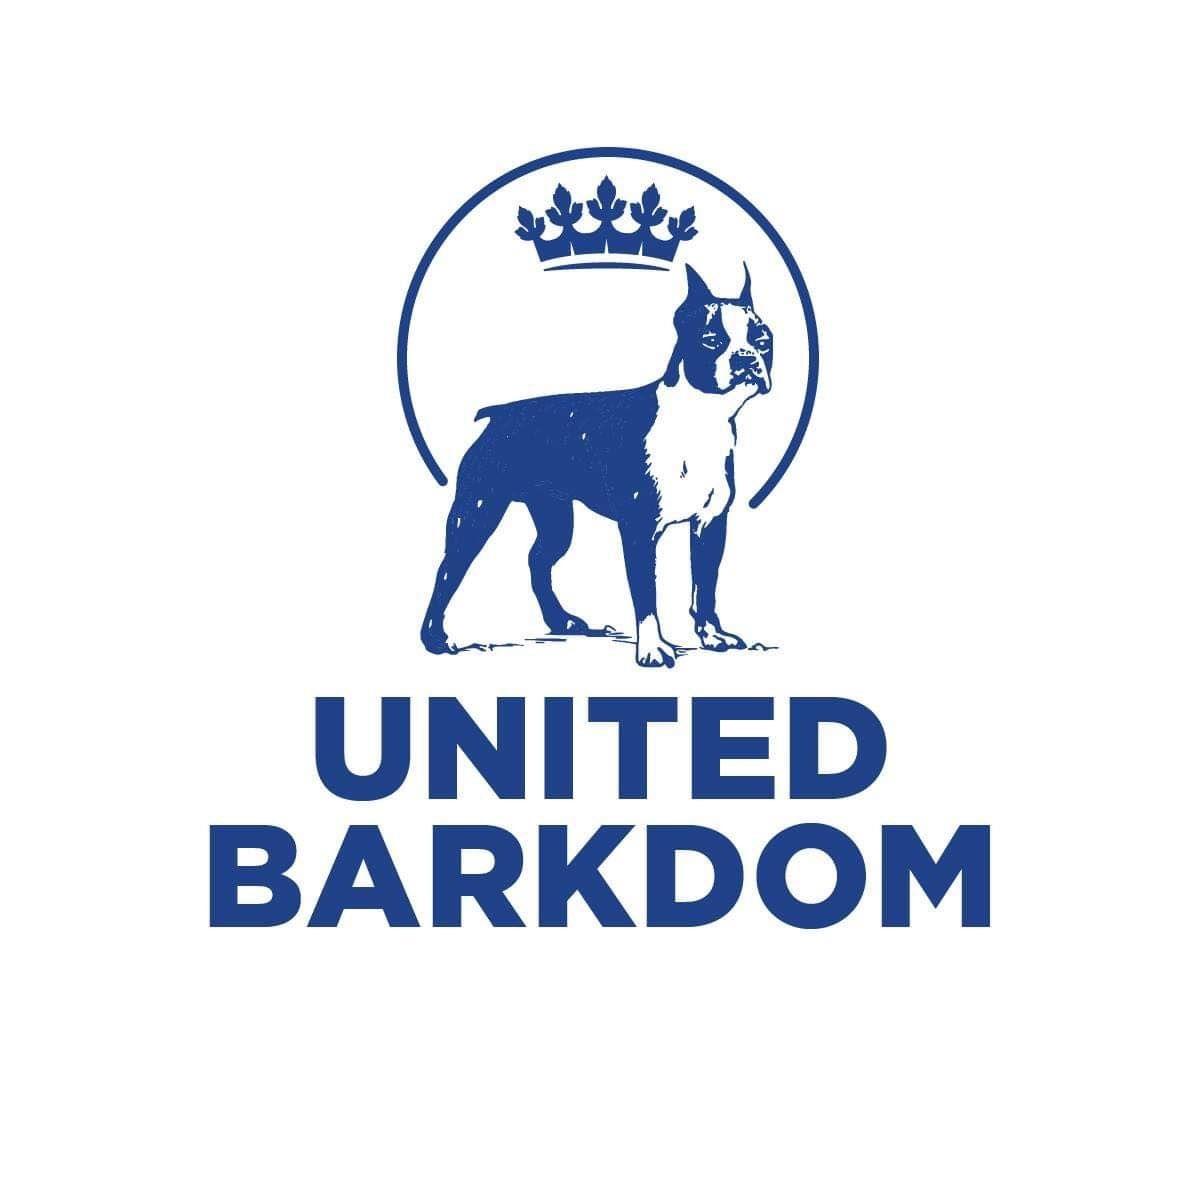 United Barkdom